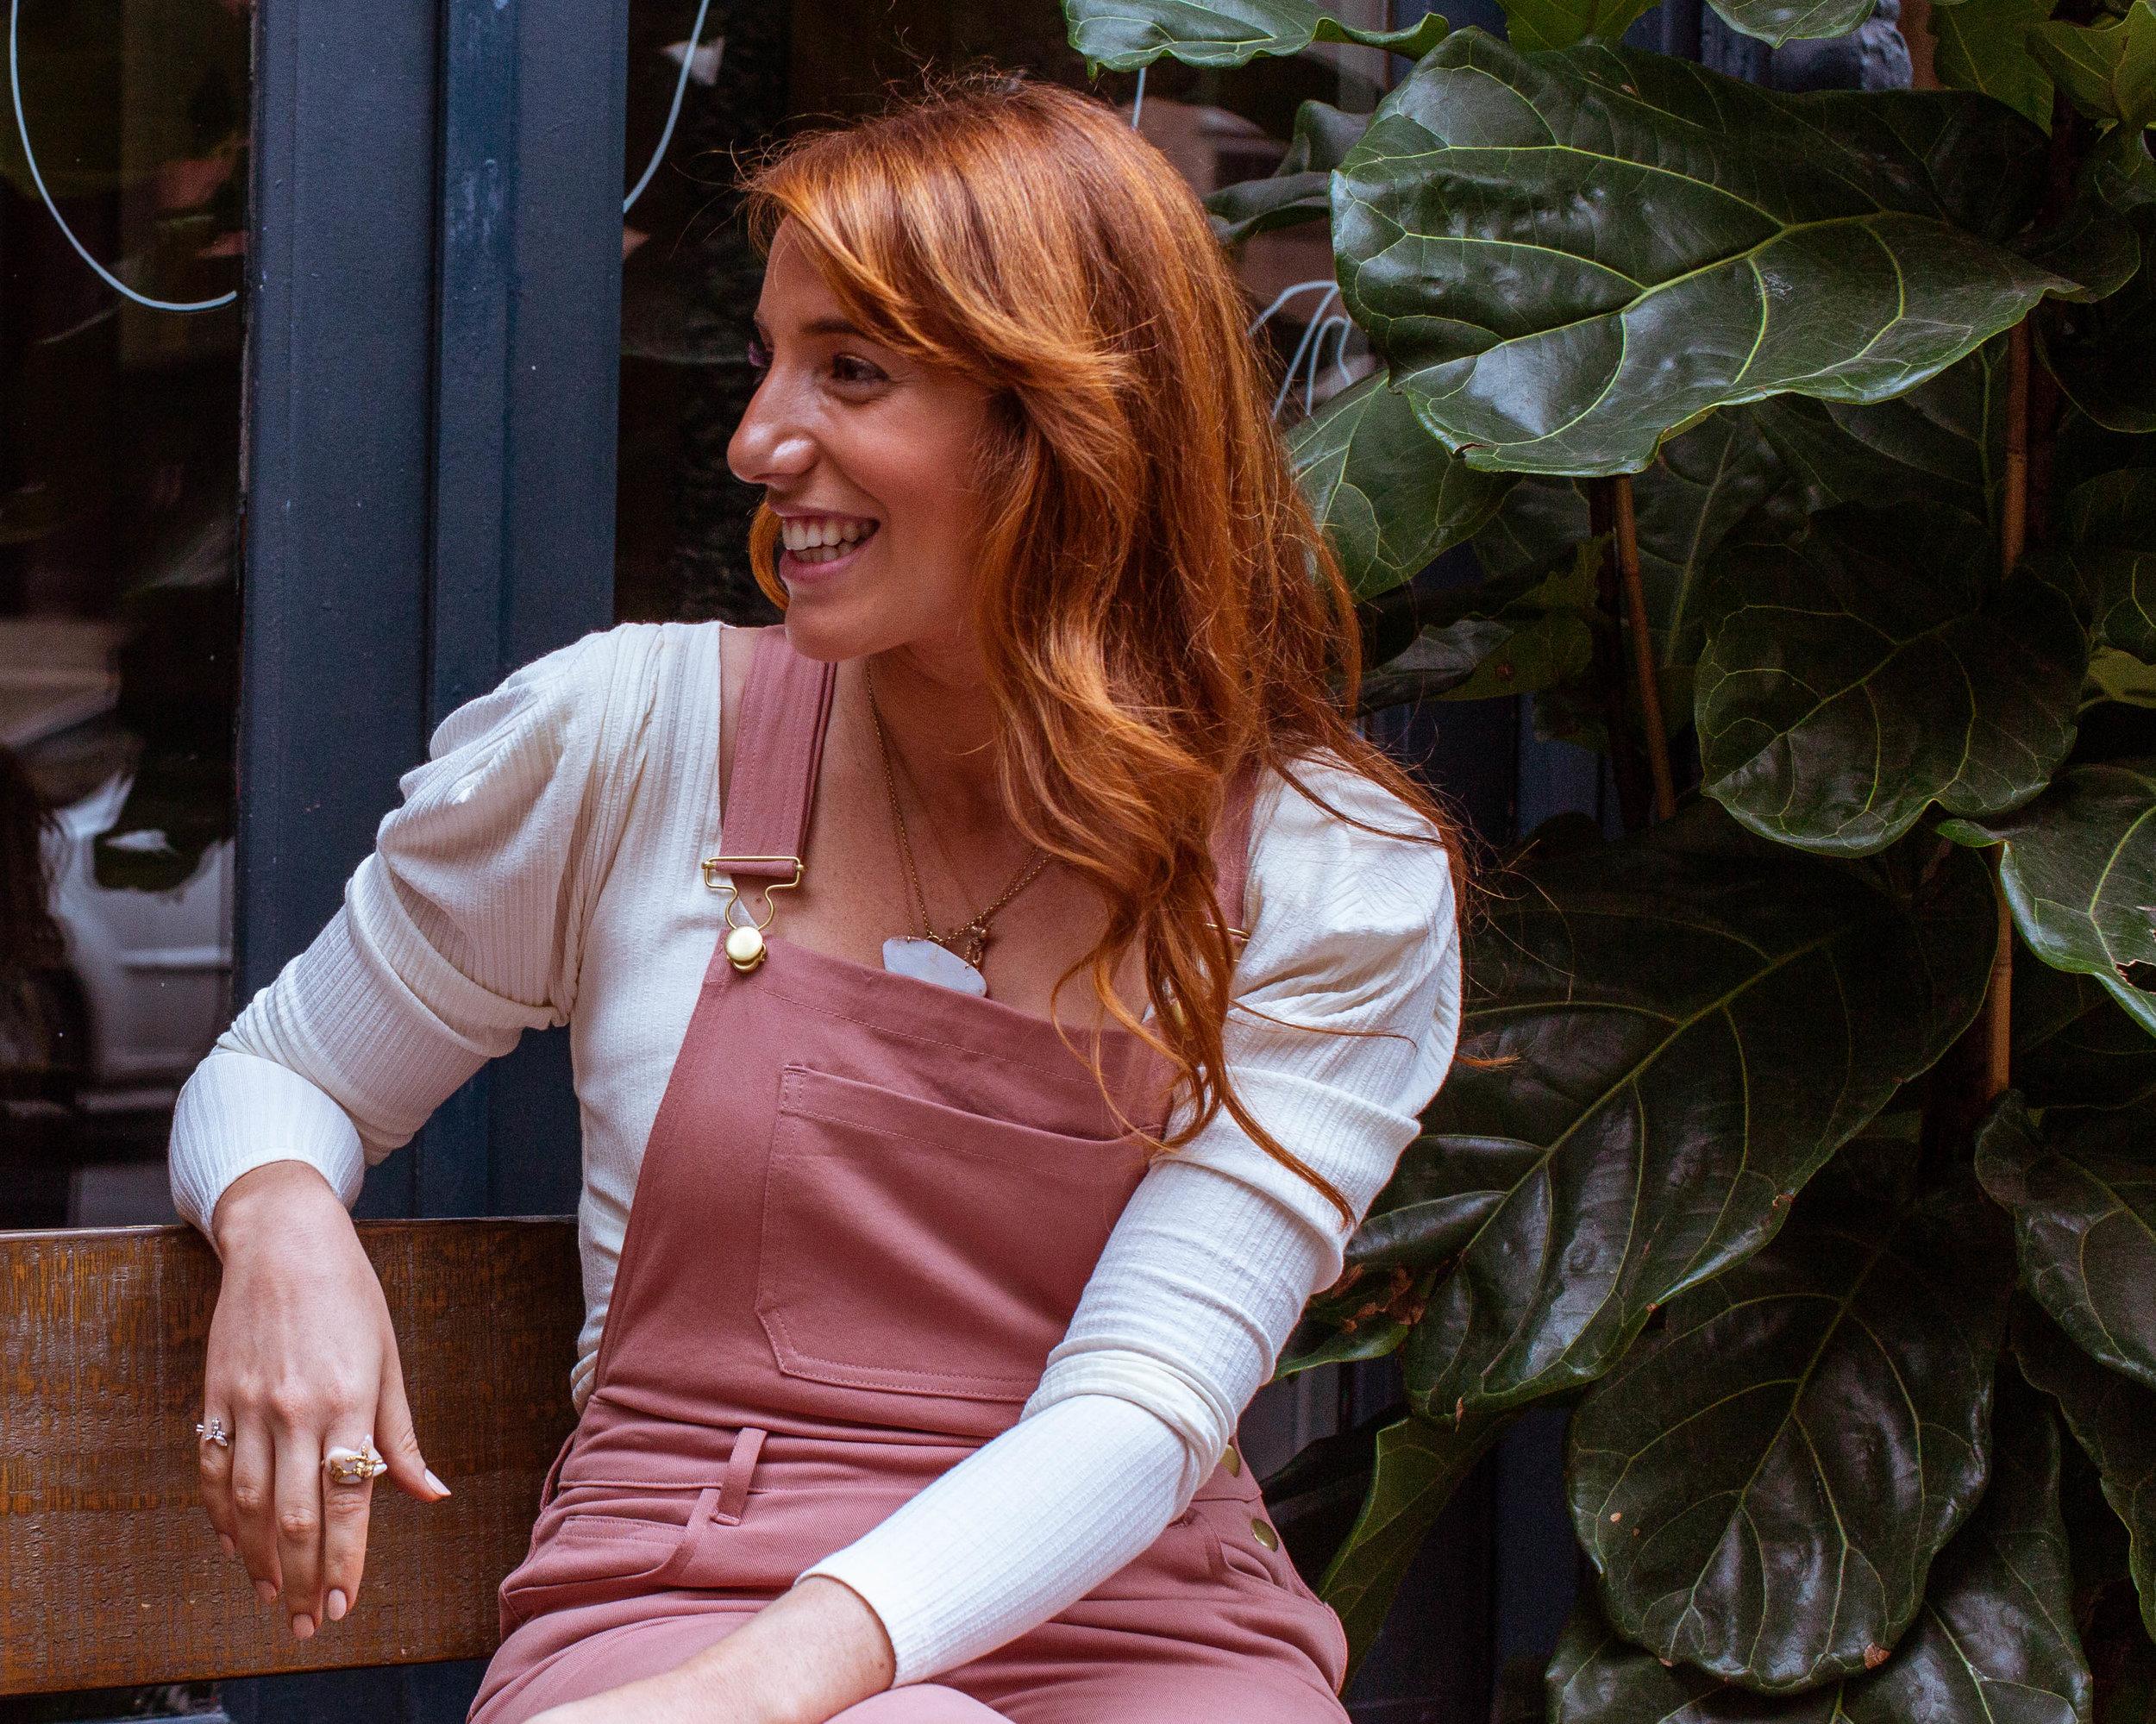 redhead (1 of 1).jpg